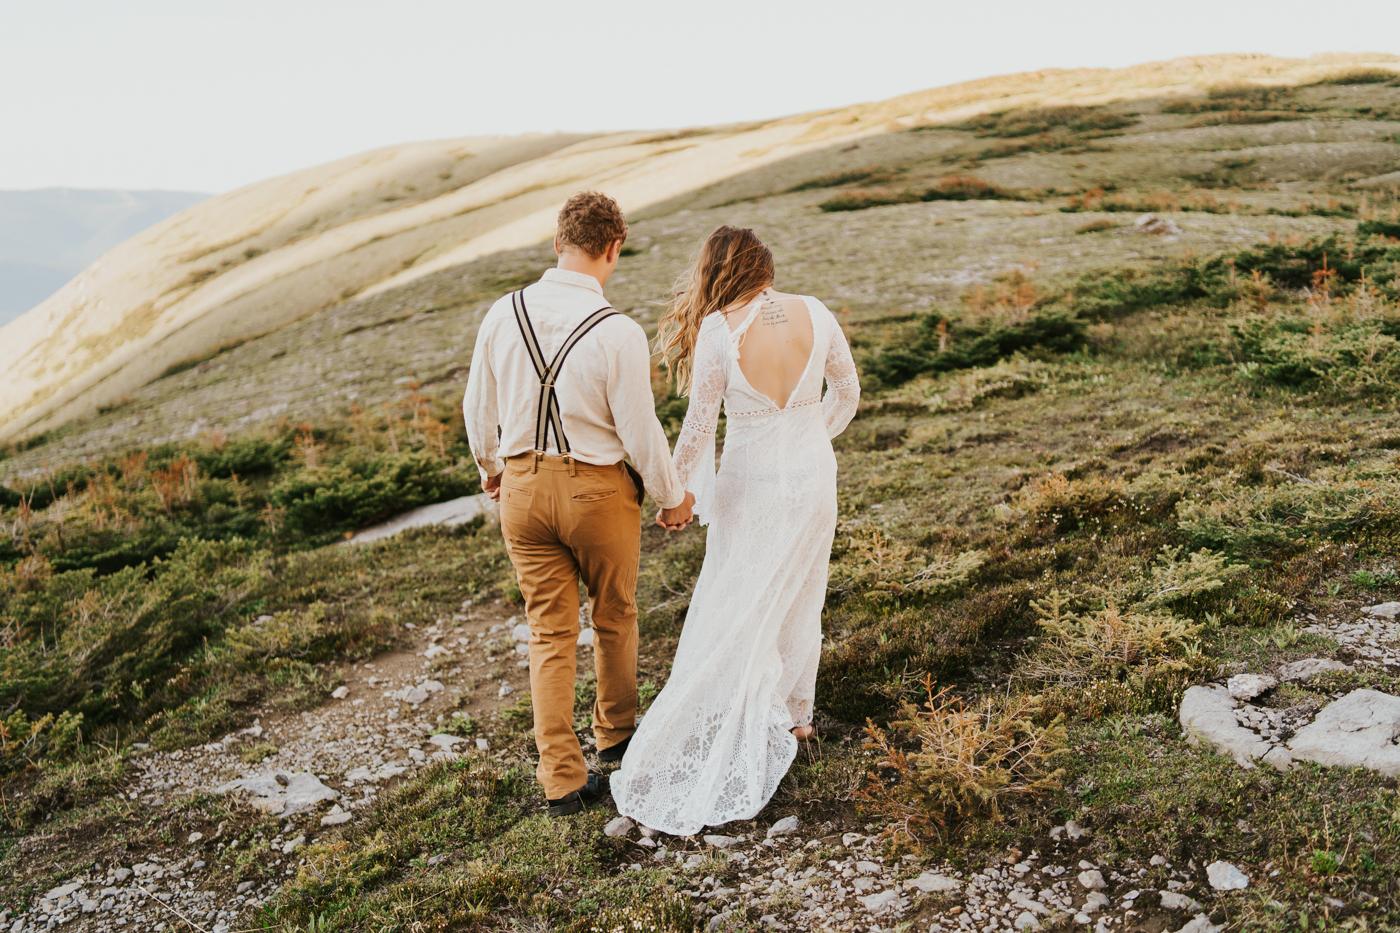 tyraephotography_photographer_wedding_elopement_engagement_photography-07904.jpg